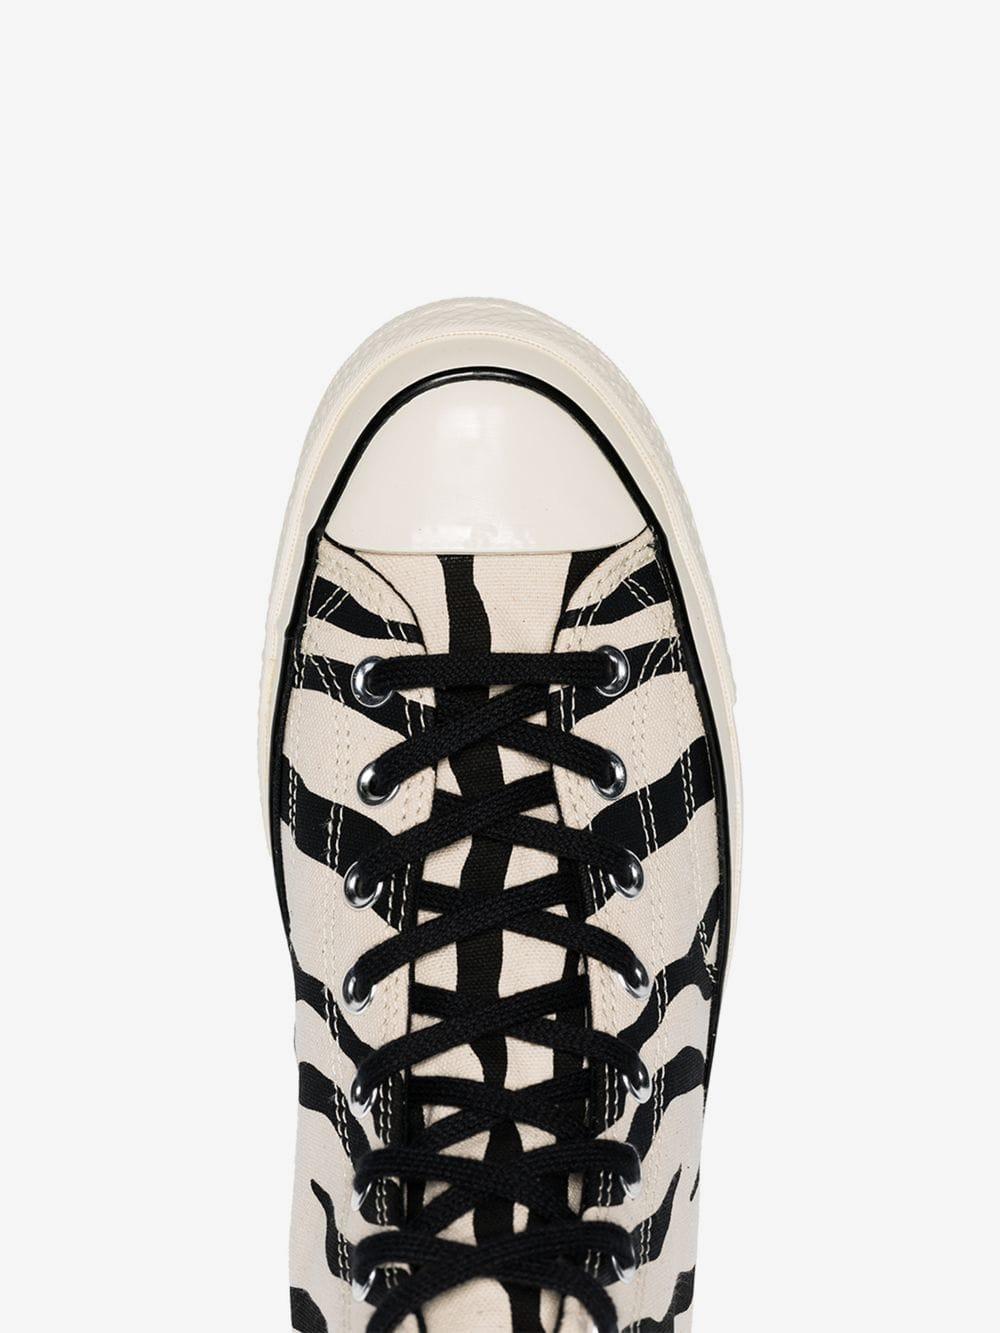 b770acd6edcc Converse - Black And White Chuck Taylor All Stars 70s Zebra Print High-top  Sneakers. View fullscreen